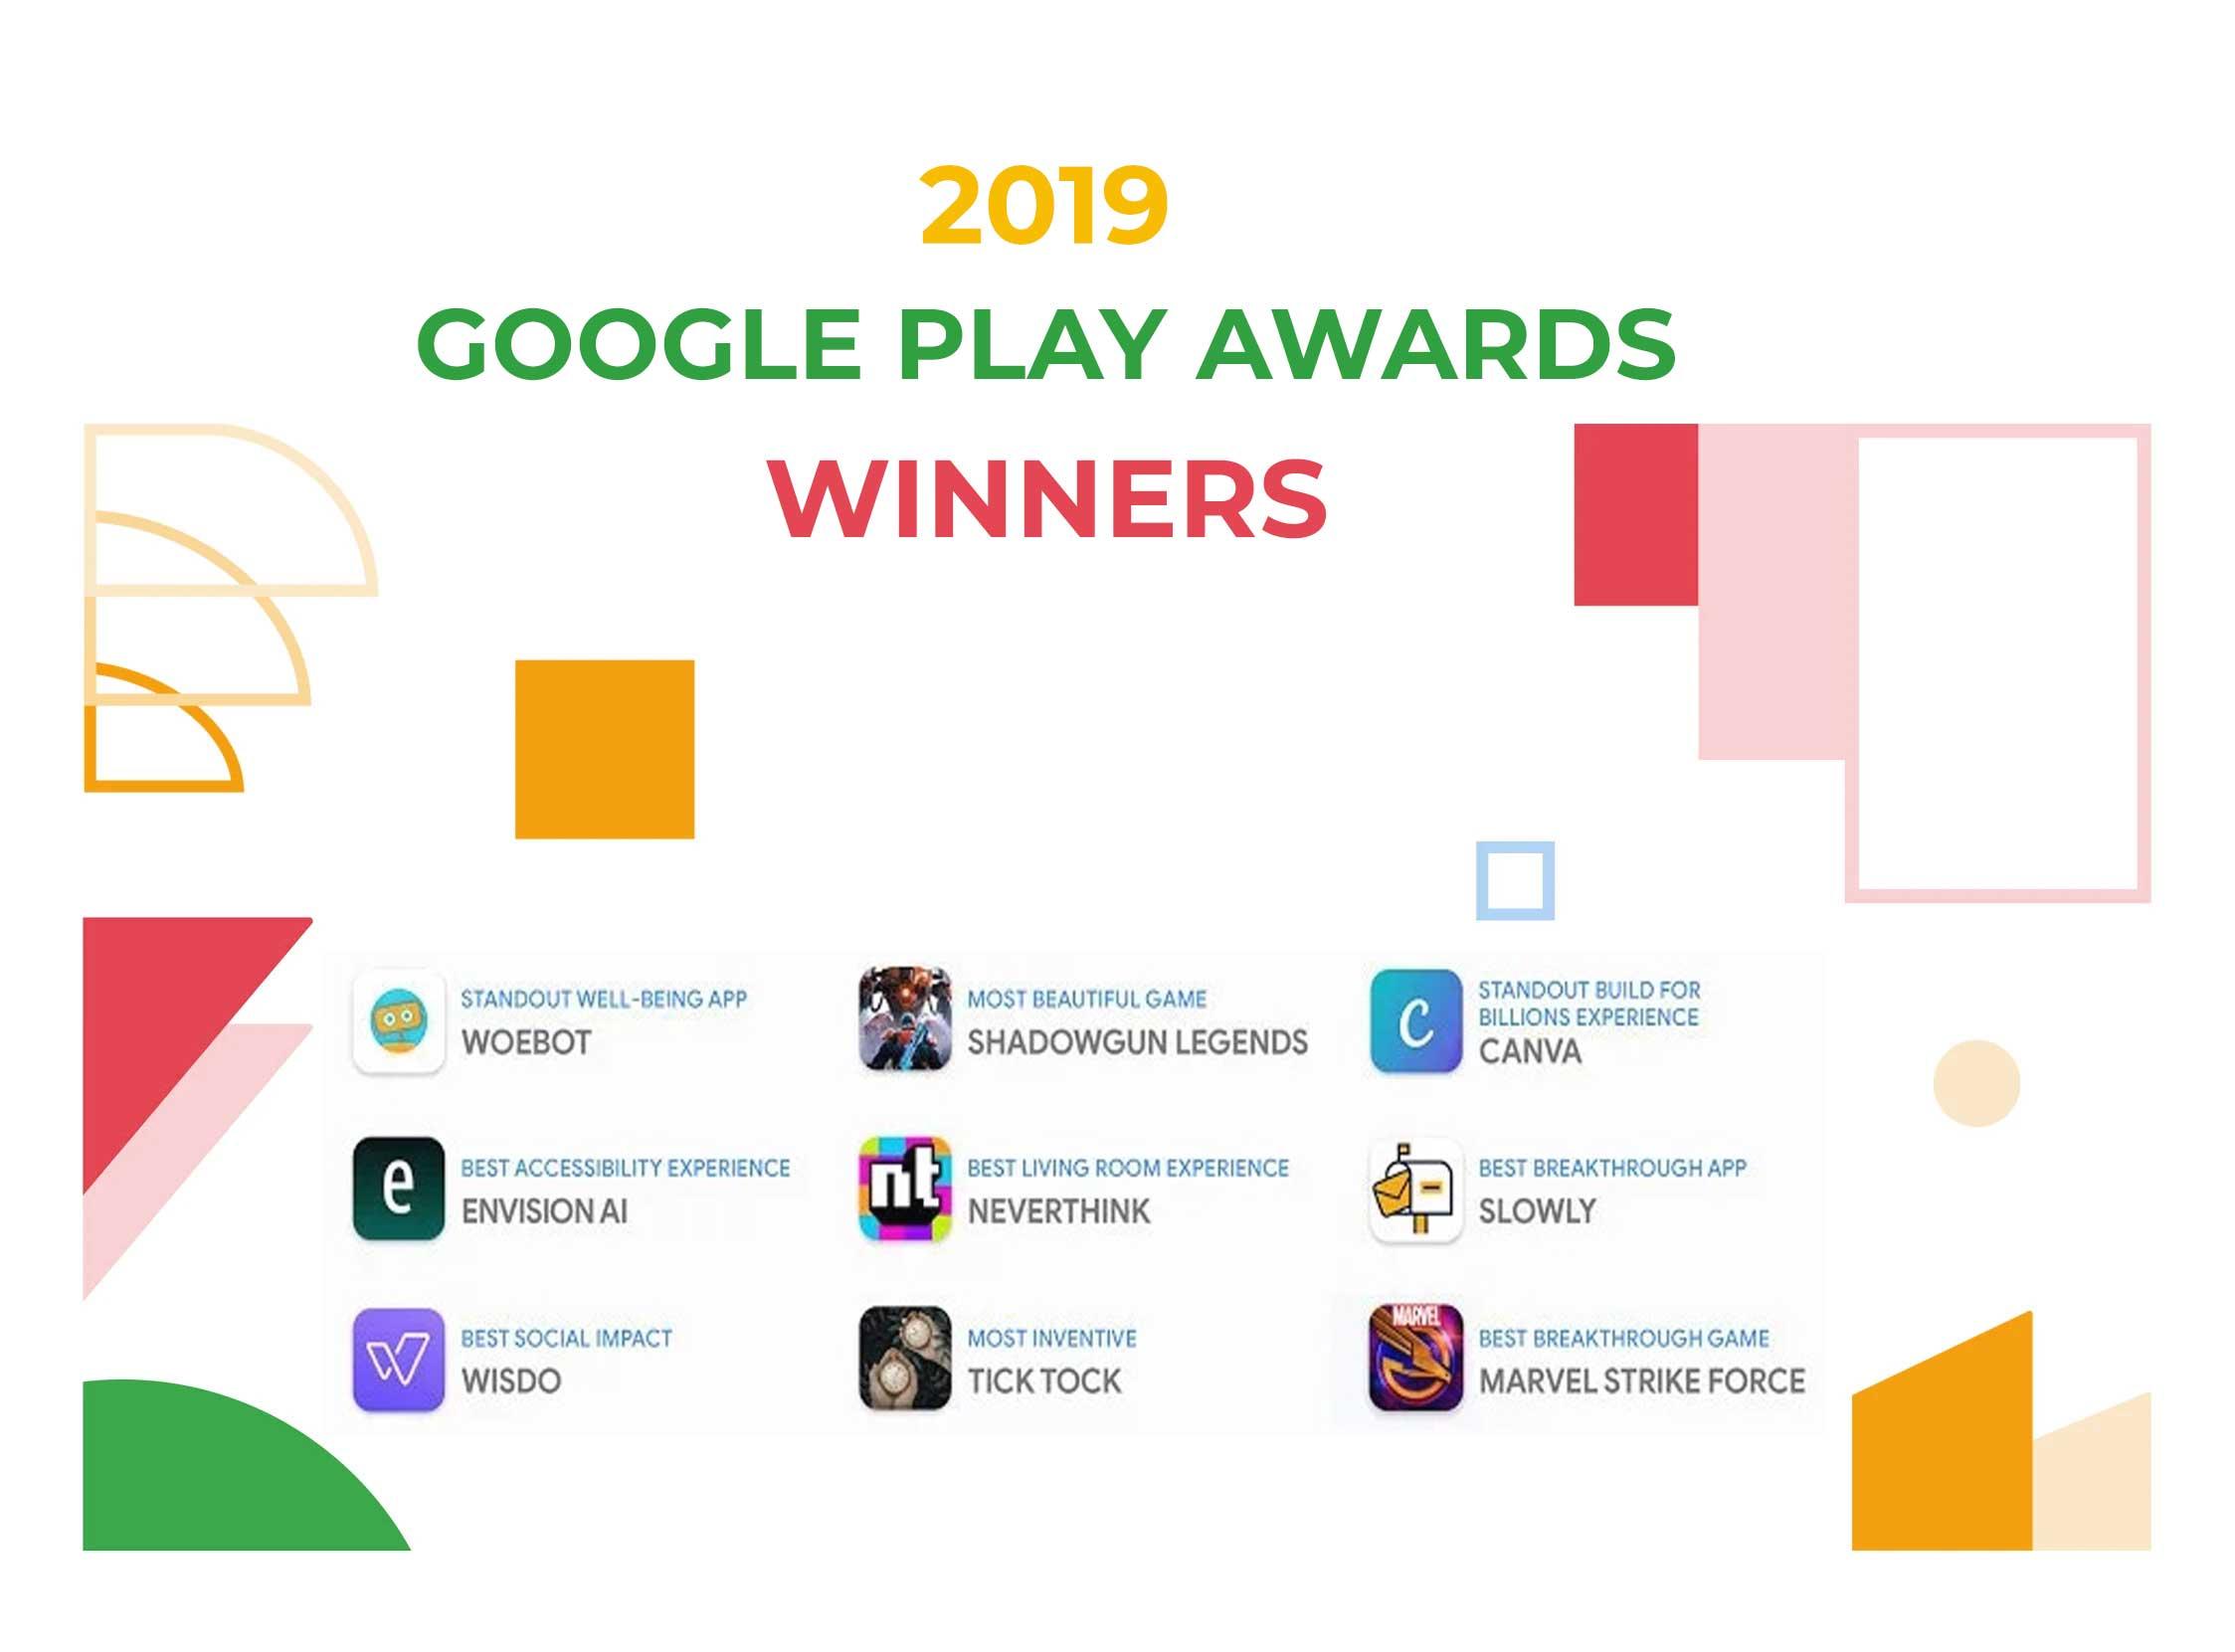 2019 Google Play Awards